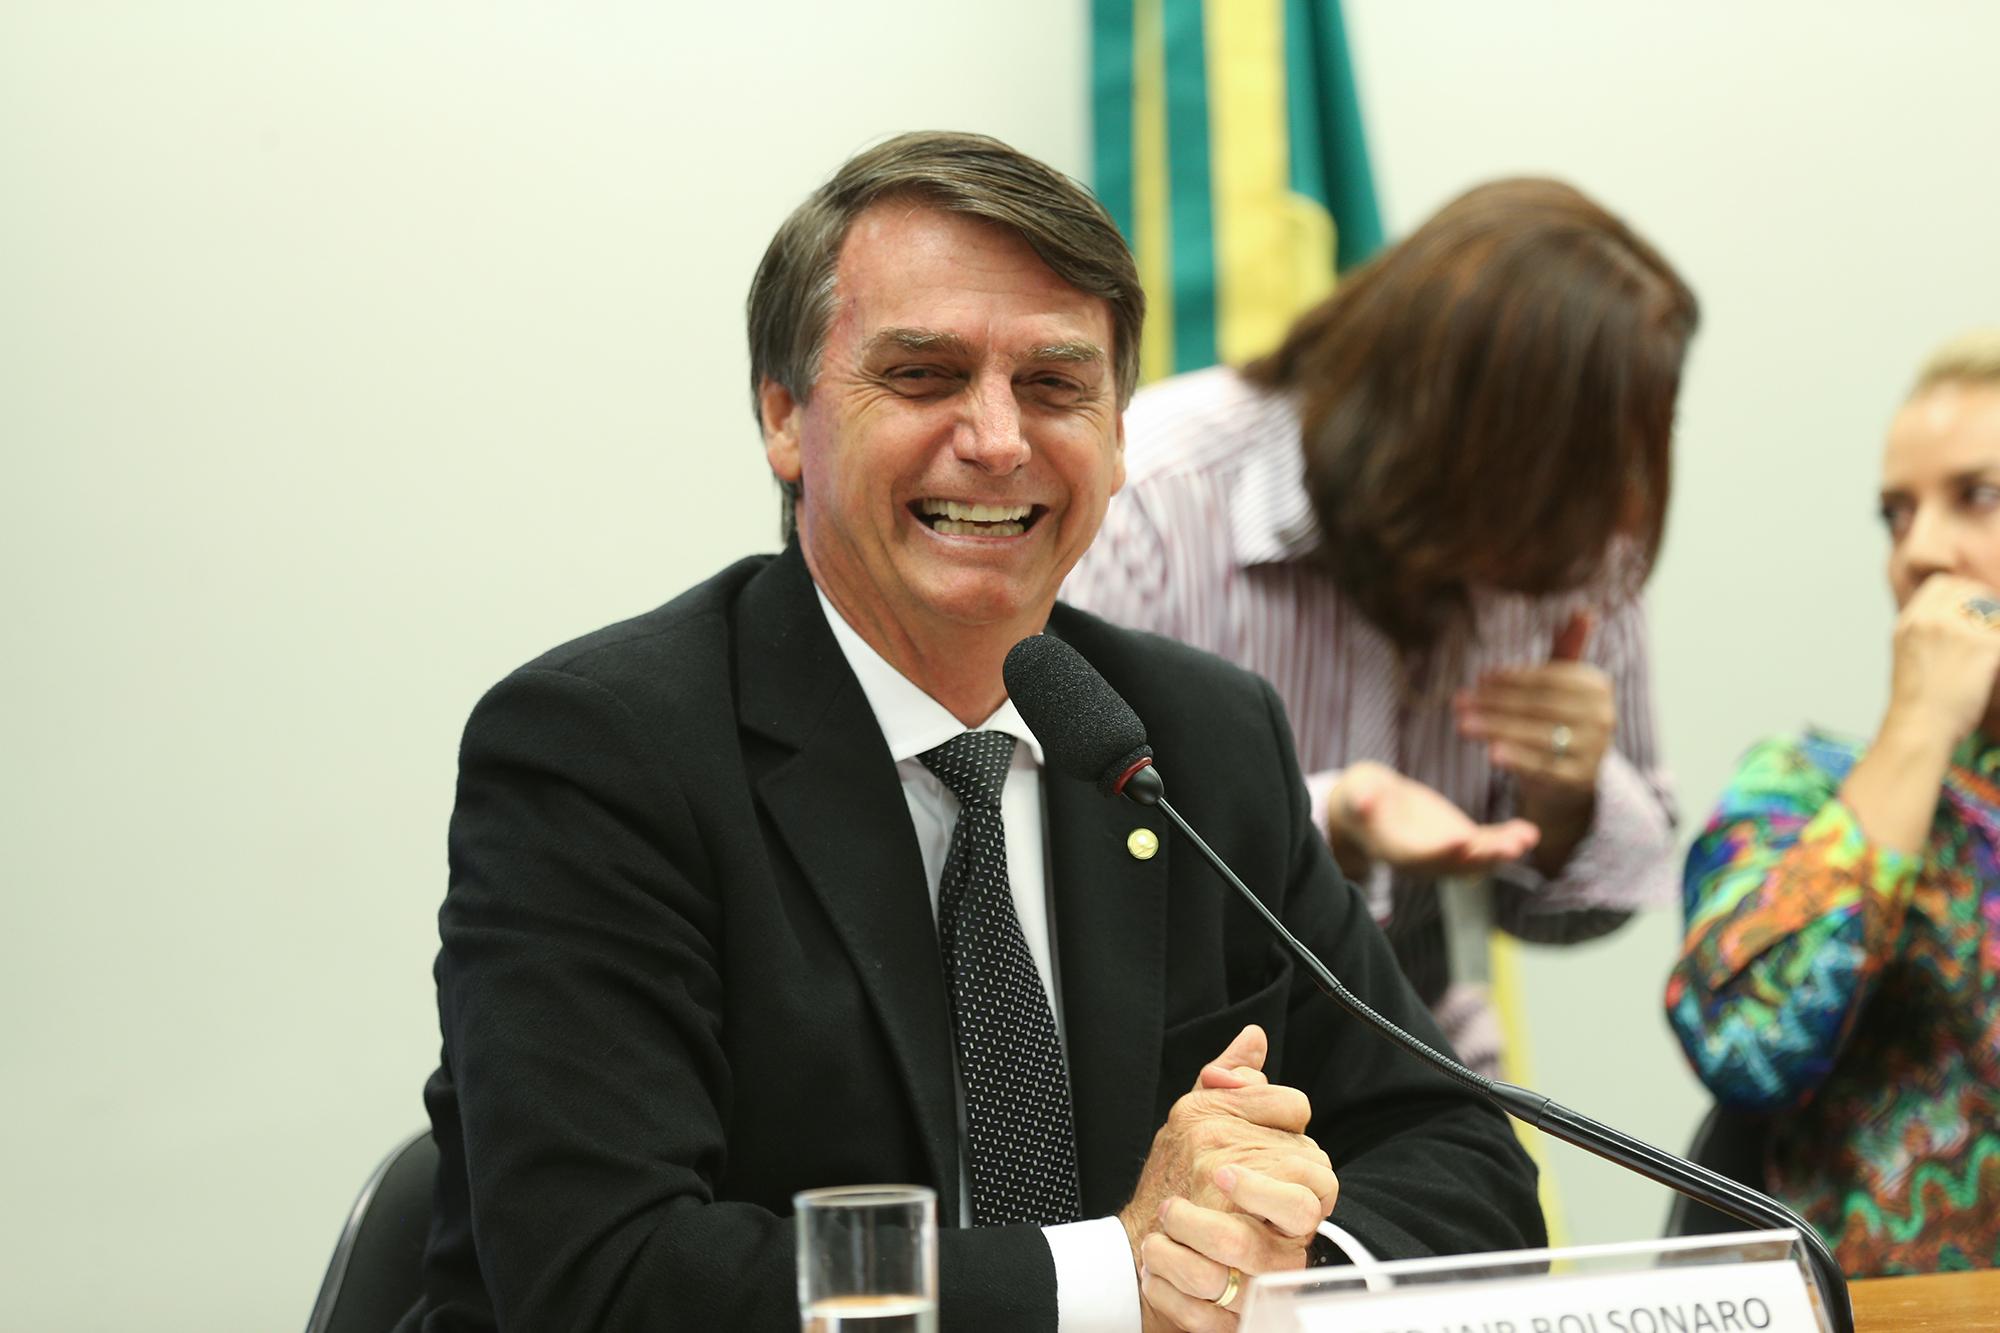 Värskel valitud uus Brasiilia president Jair Bolsonaro. Foto: Fabio Rodrigues Pozzebom/Agência Brasil (CC BY 2.0)